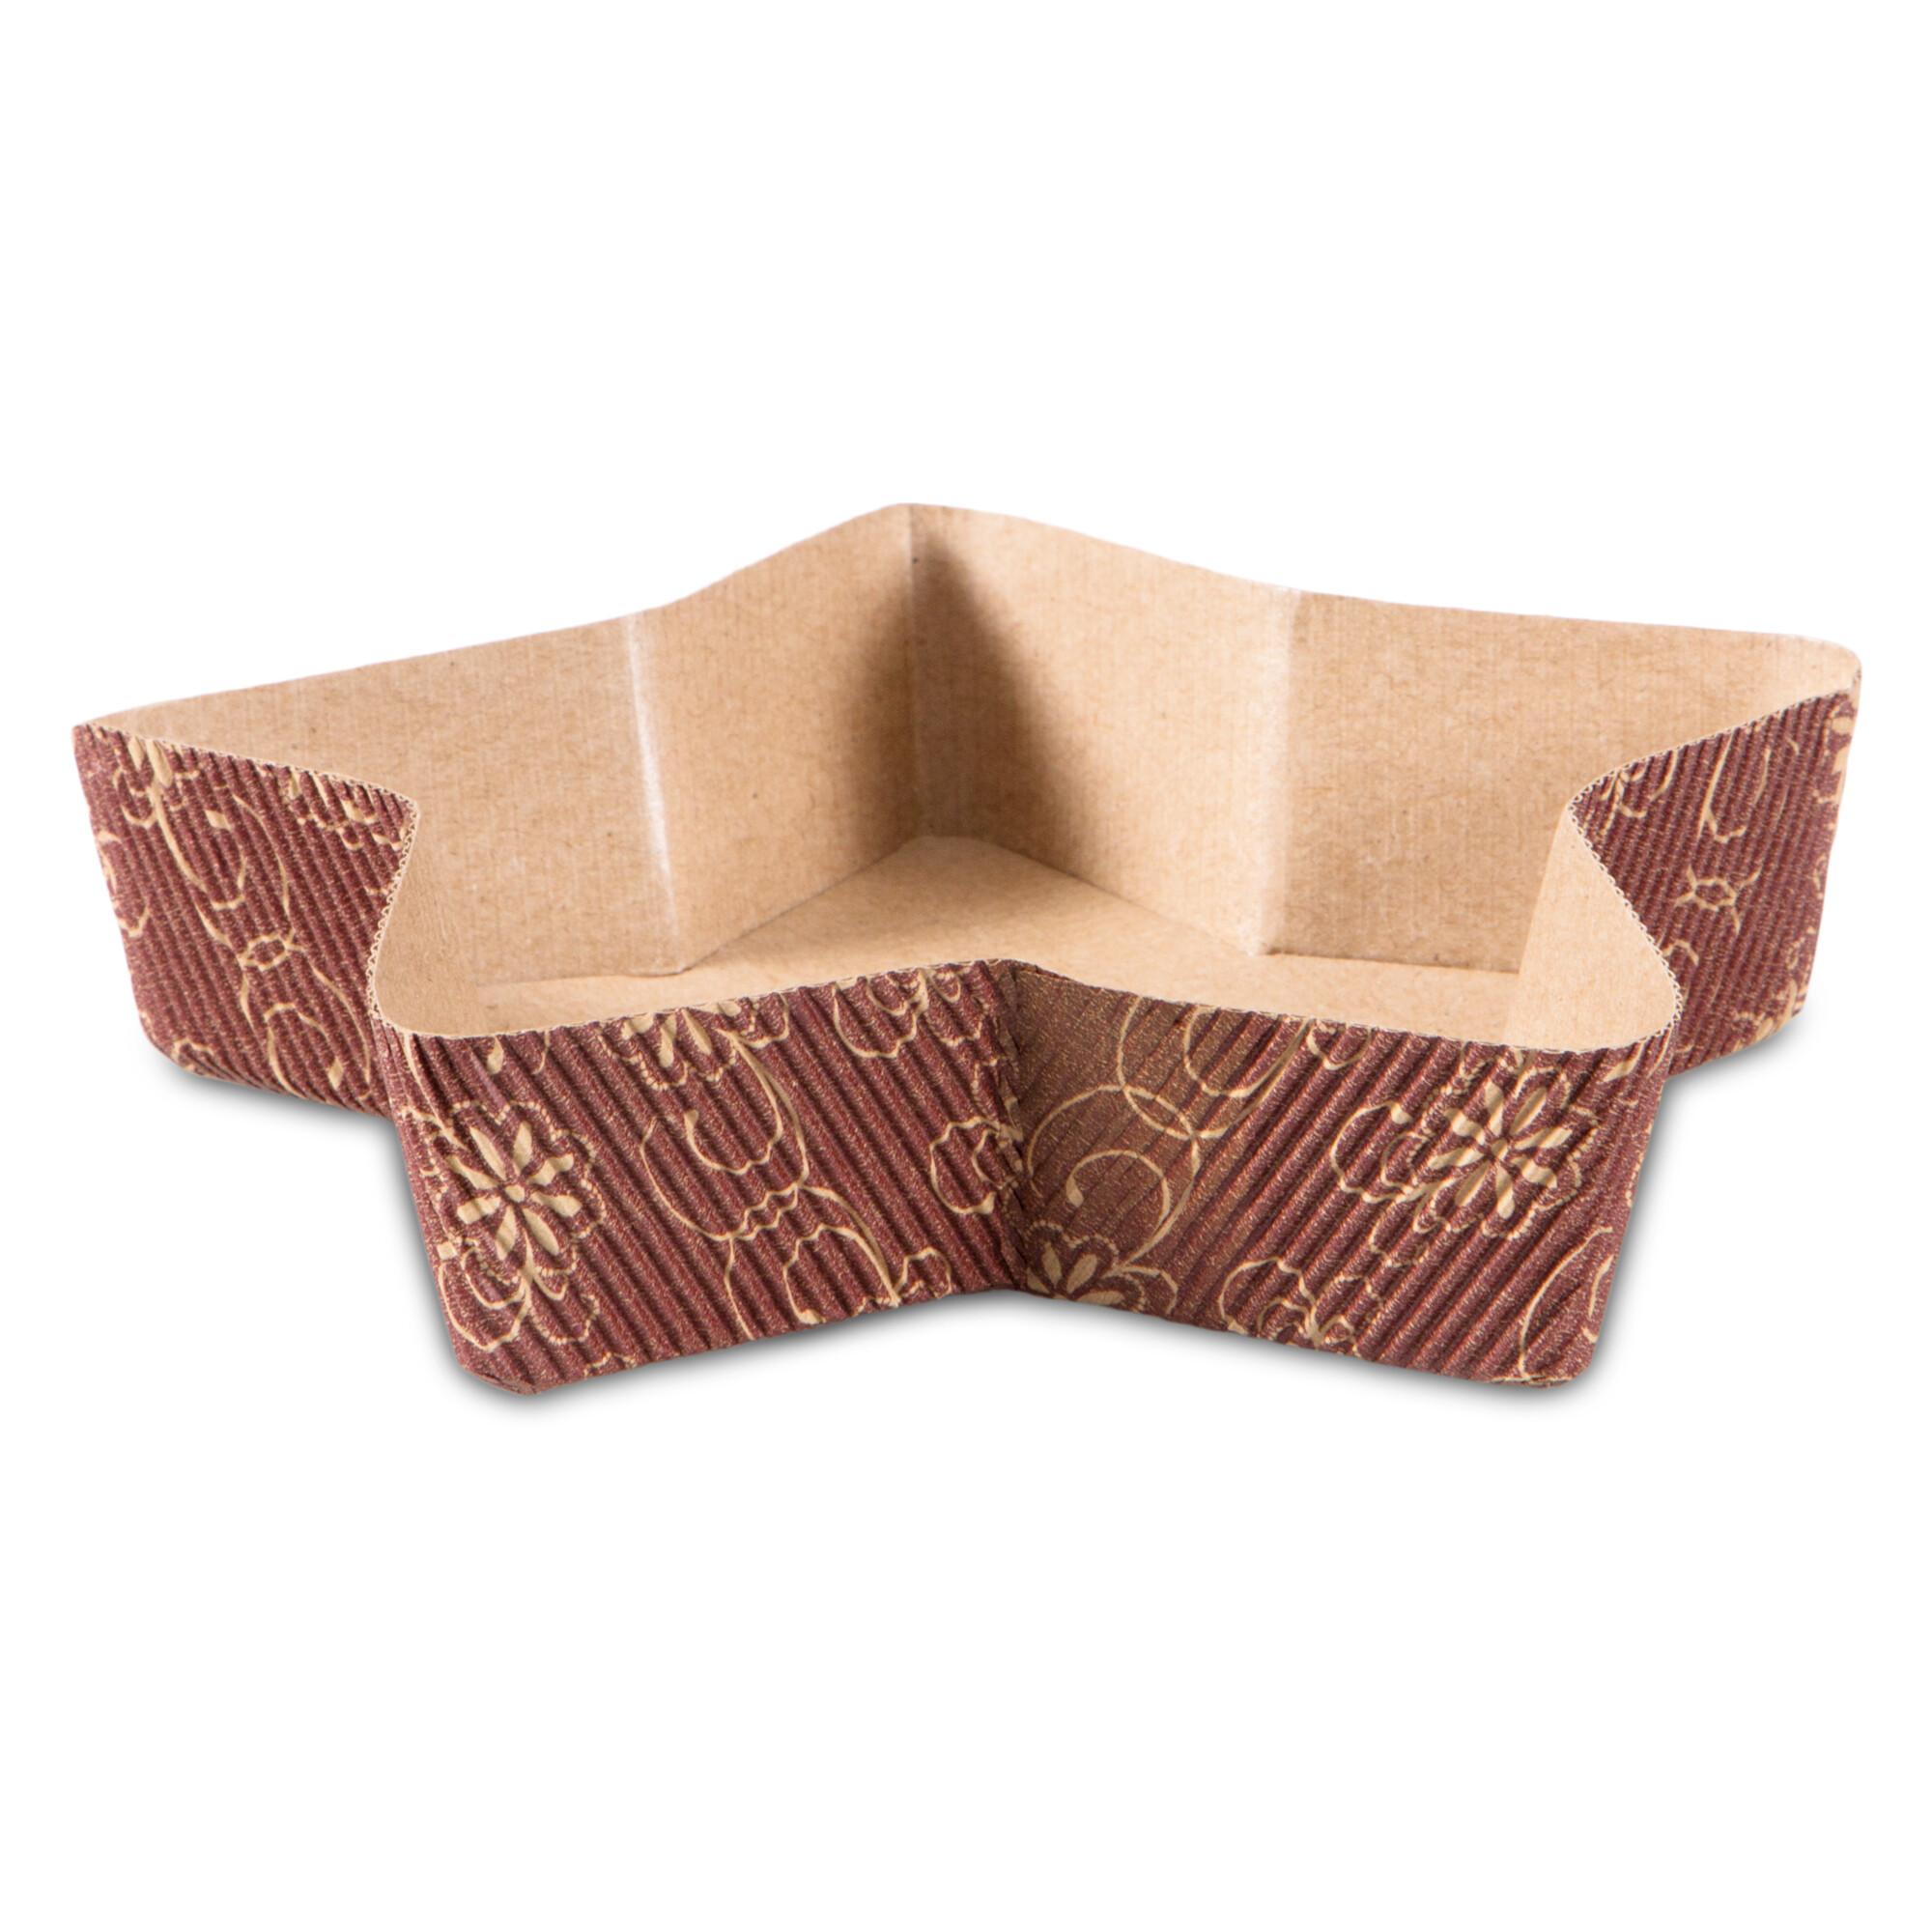 Papier-Backform - Stern - 4 Stück